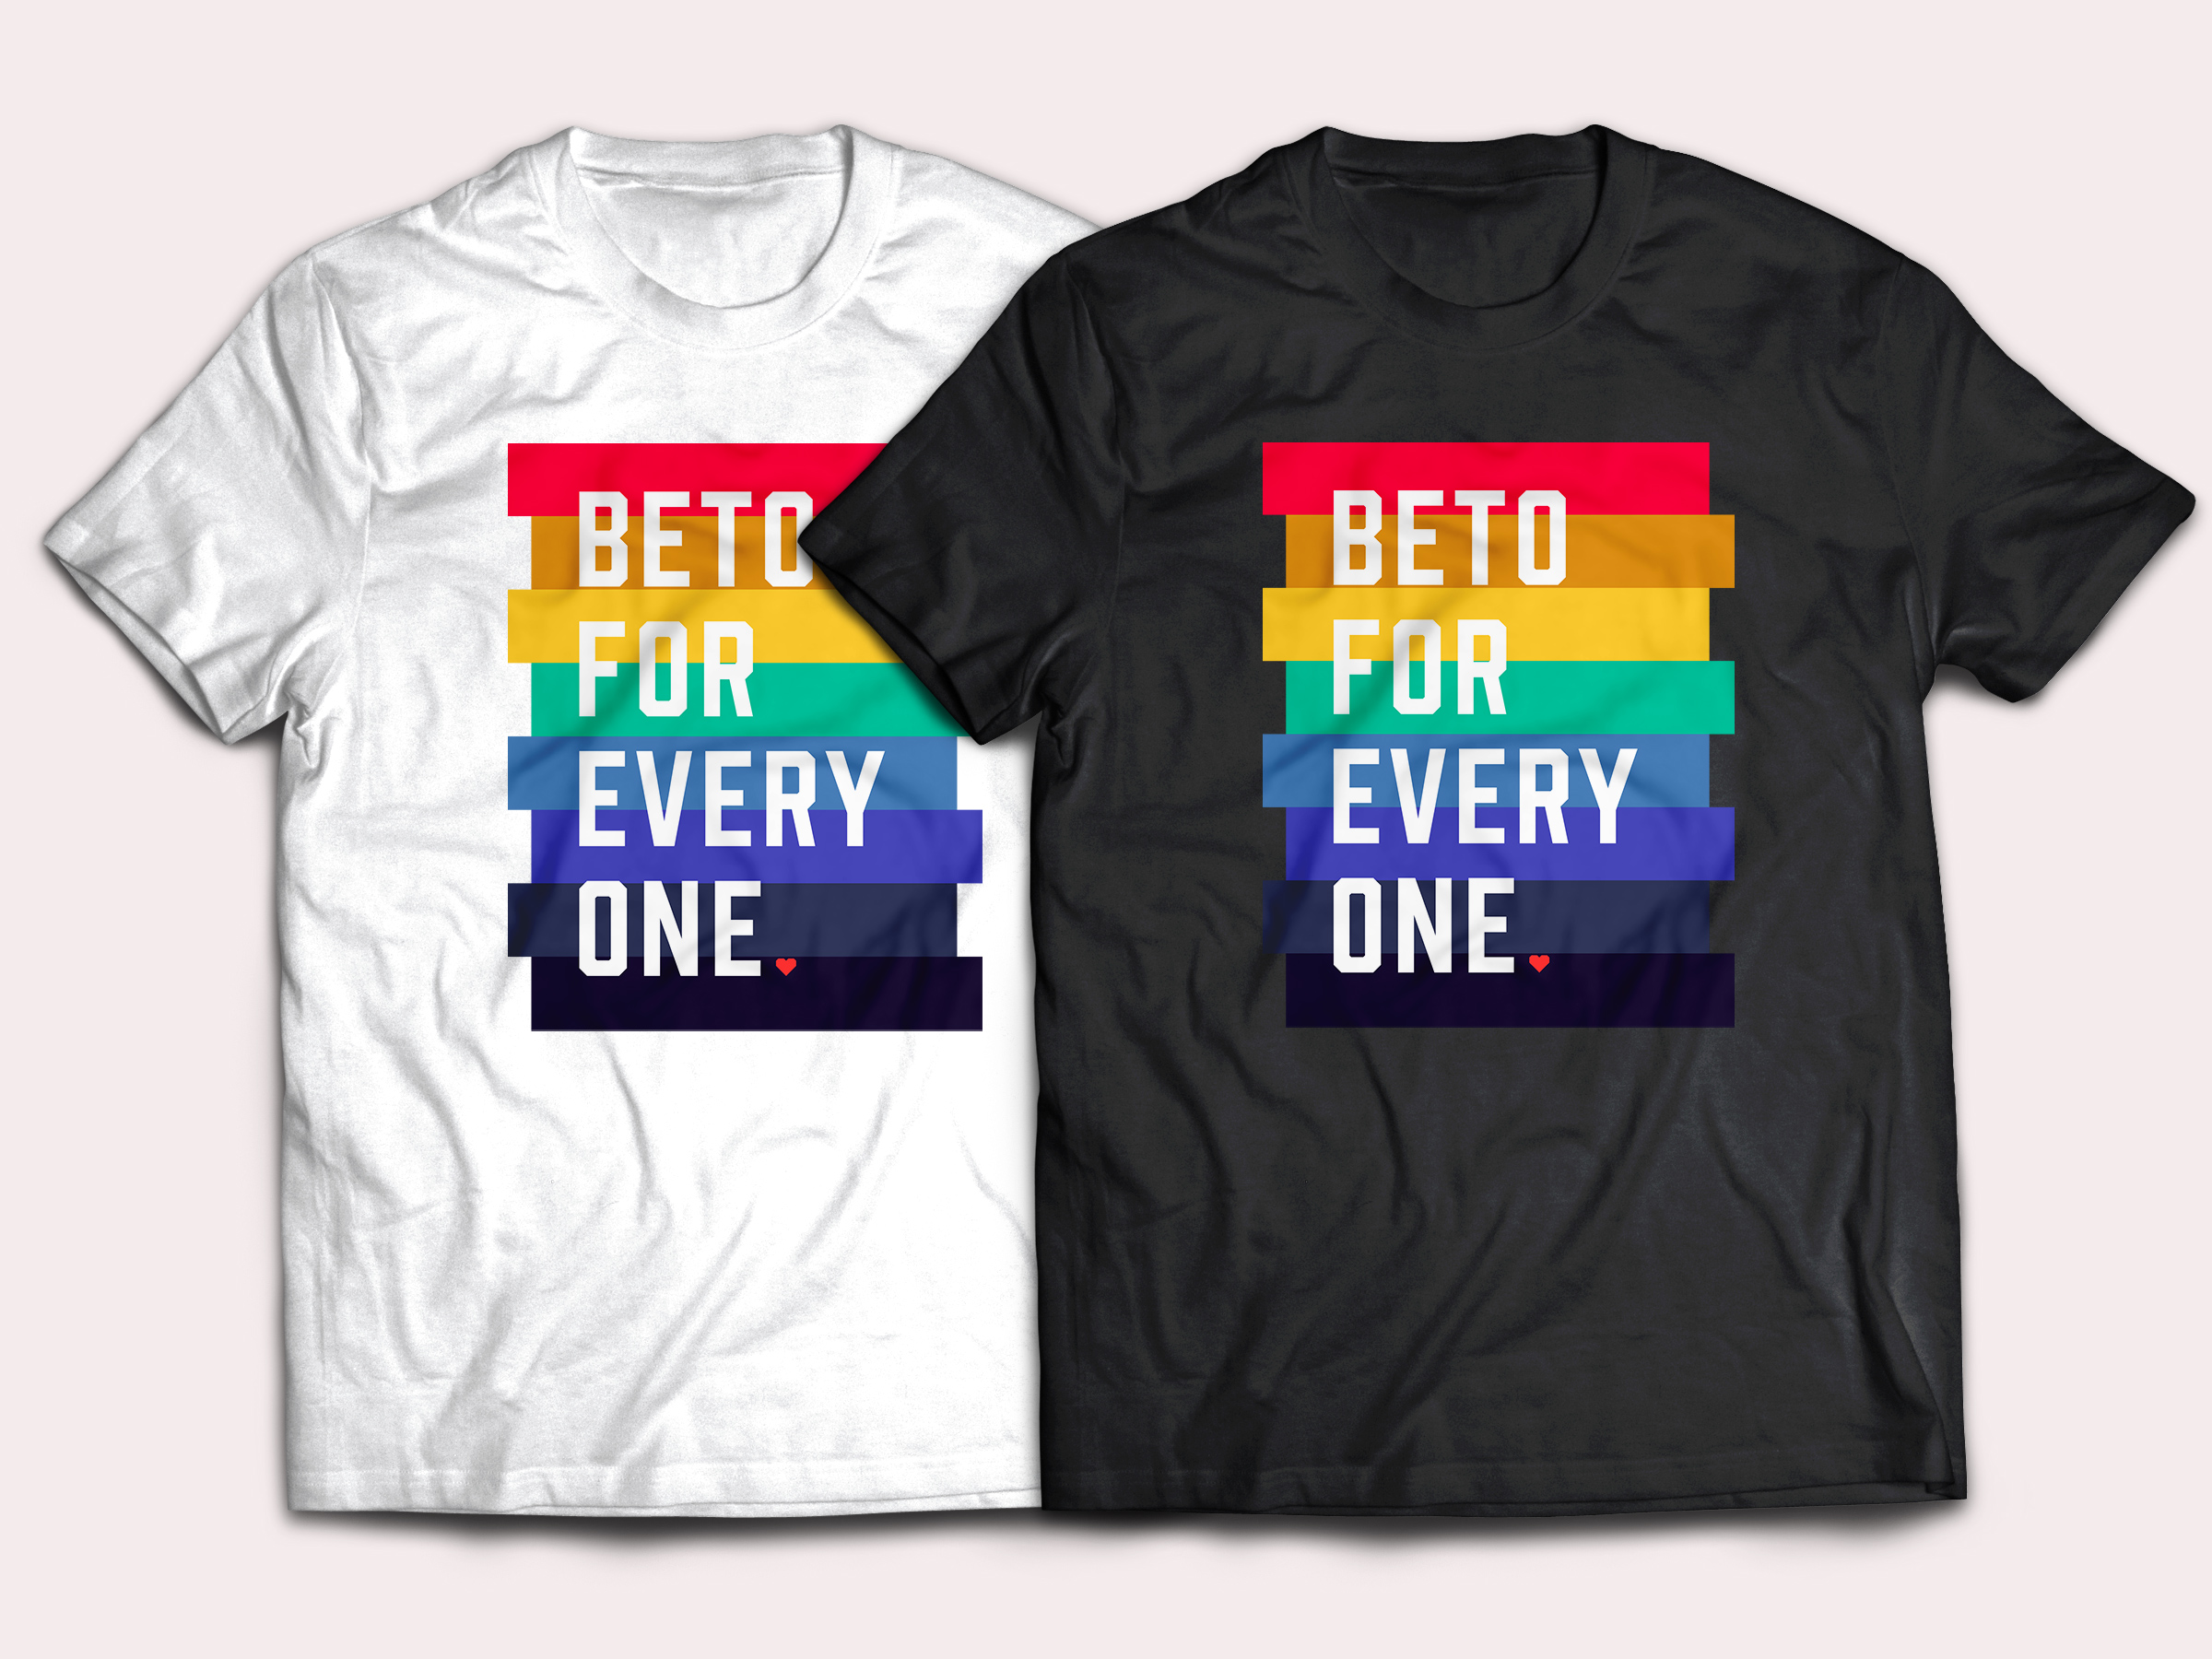 BFA-lgbtq-shirt-2.png